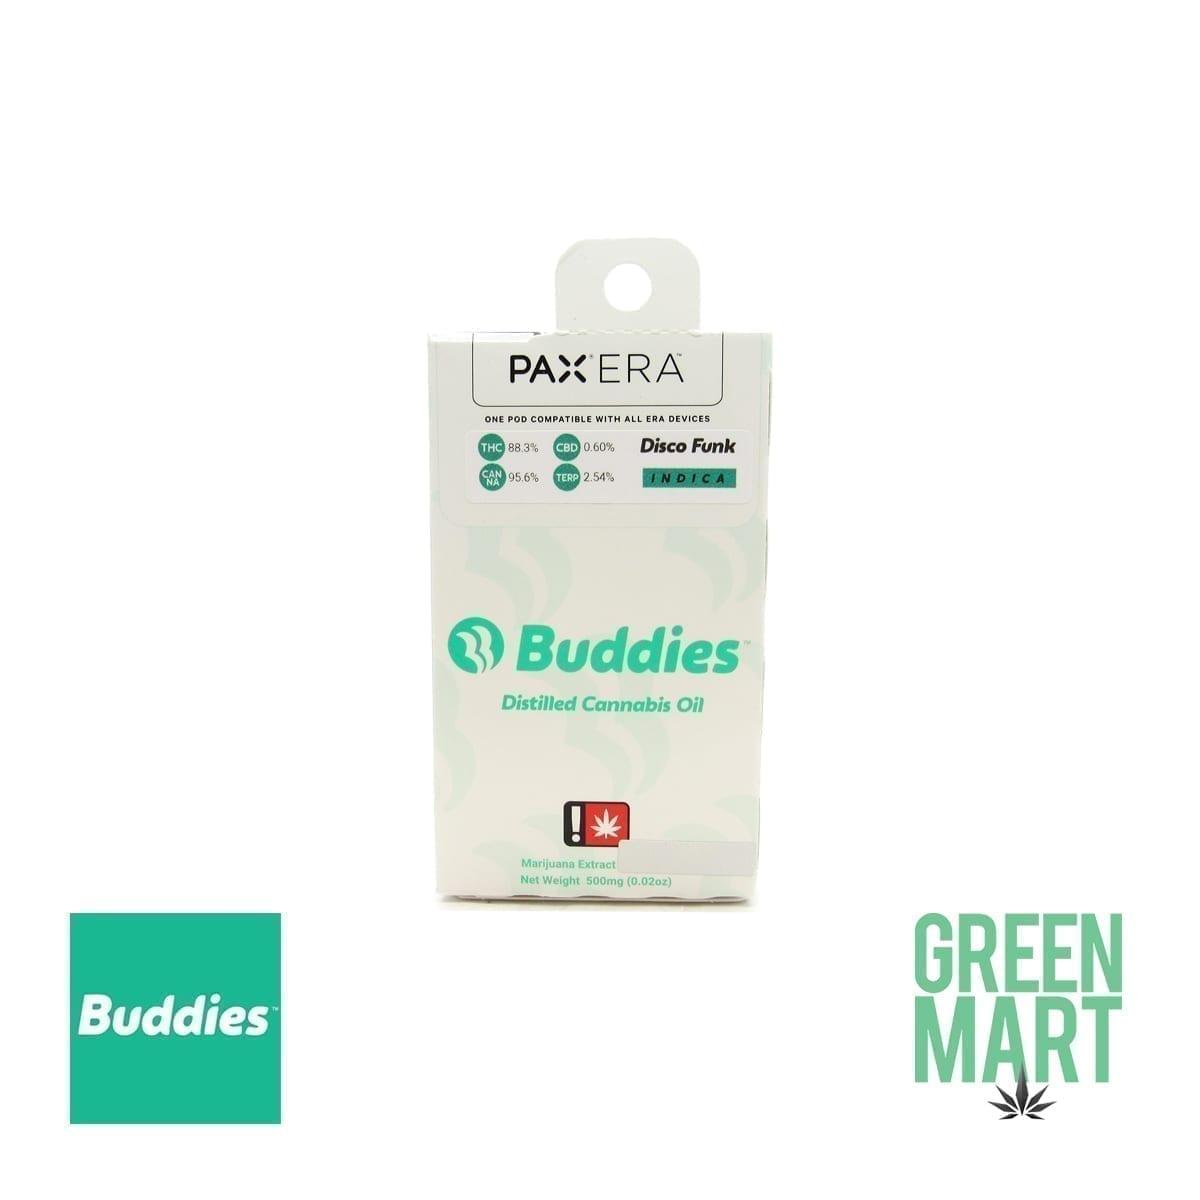 Buddies Brand Pax Pod - Disco Funk